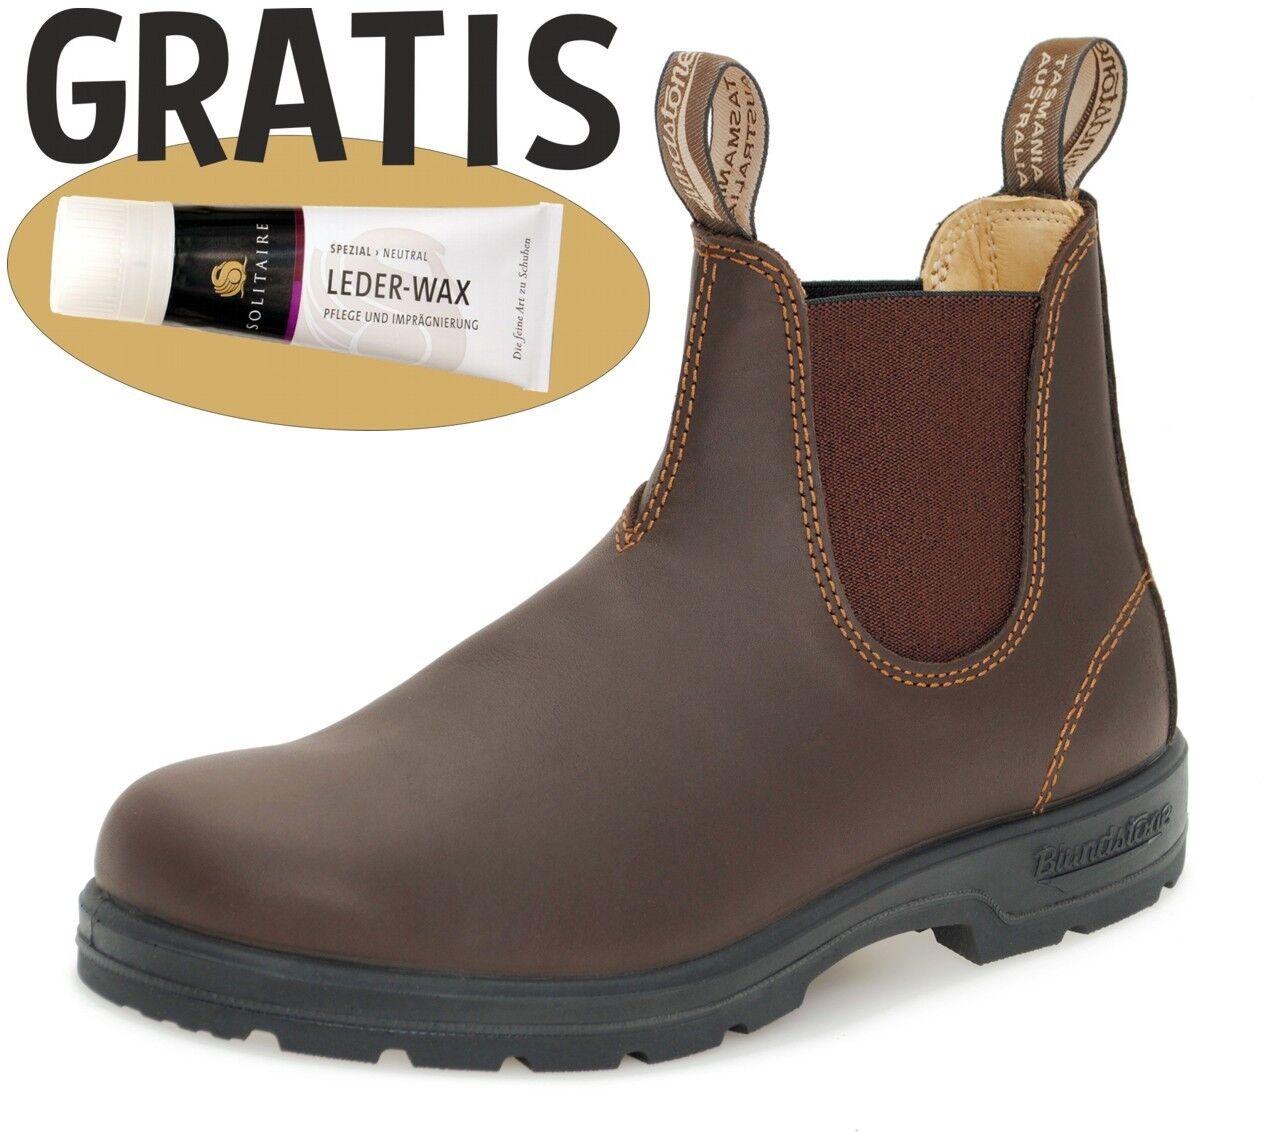 Blaundstone 550 Chelsea Stiefel Stiefel Leder Outdoor Büro - Walnut braun +Lederwax